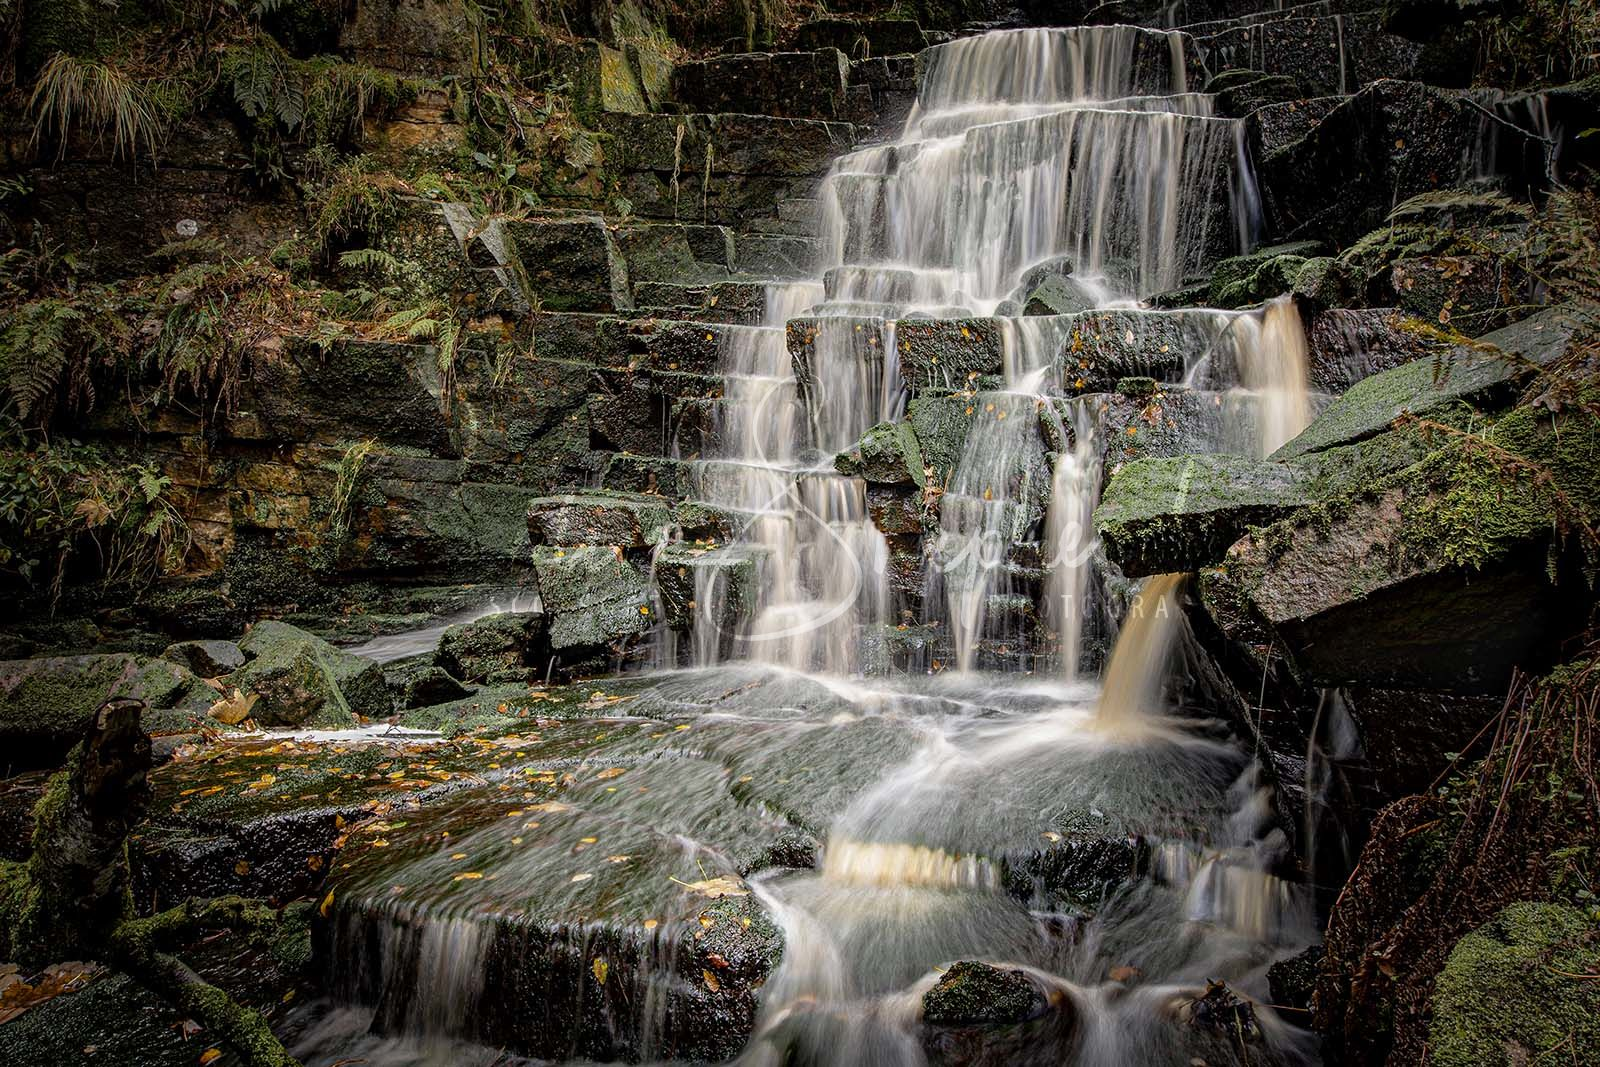 Hatch Brook Waterfall